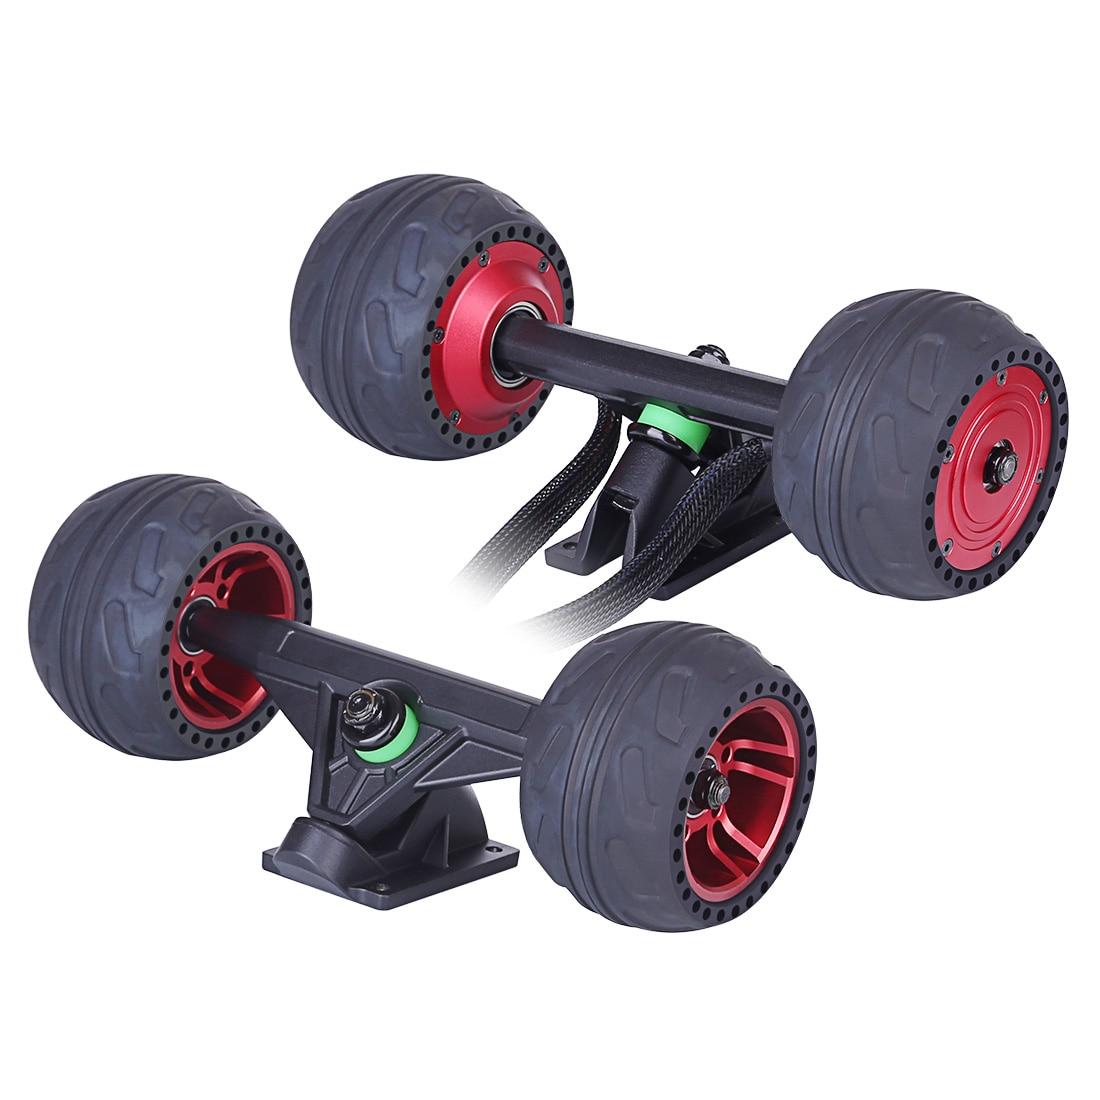 High Recommed 105LMH Hub Motor Set - Black/Red (Hub Motor + Front Wheel + Trucks)